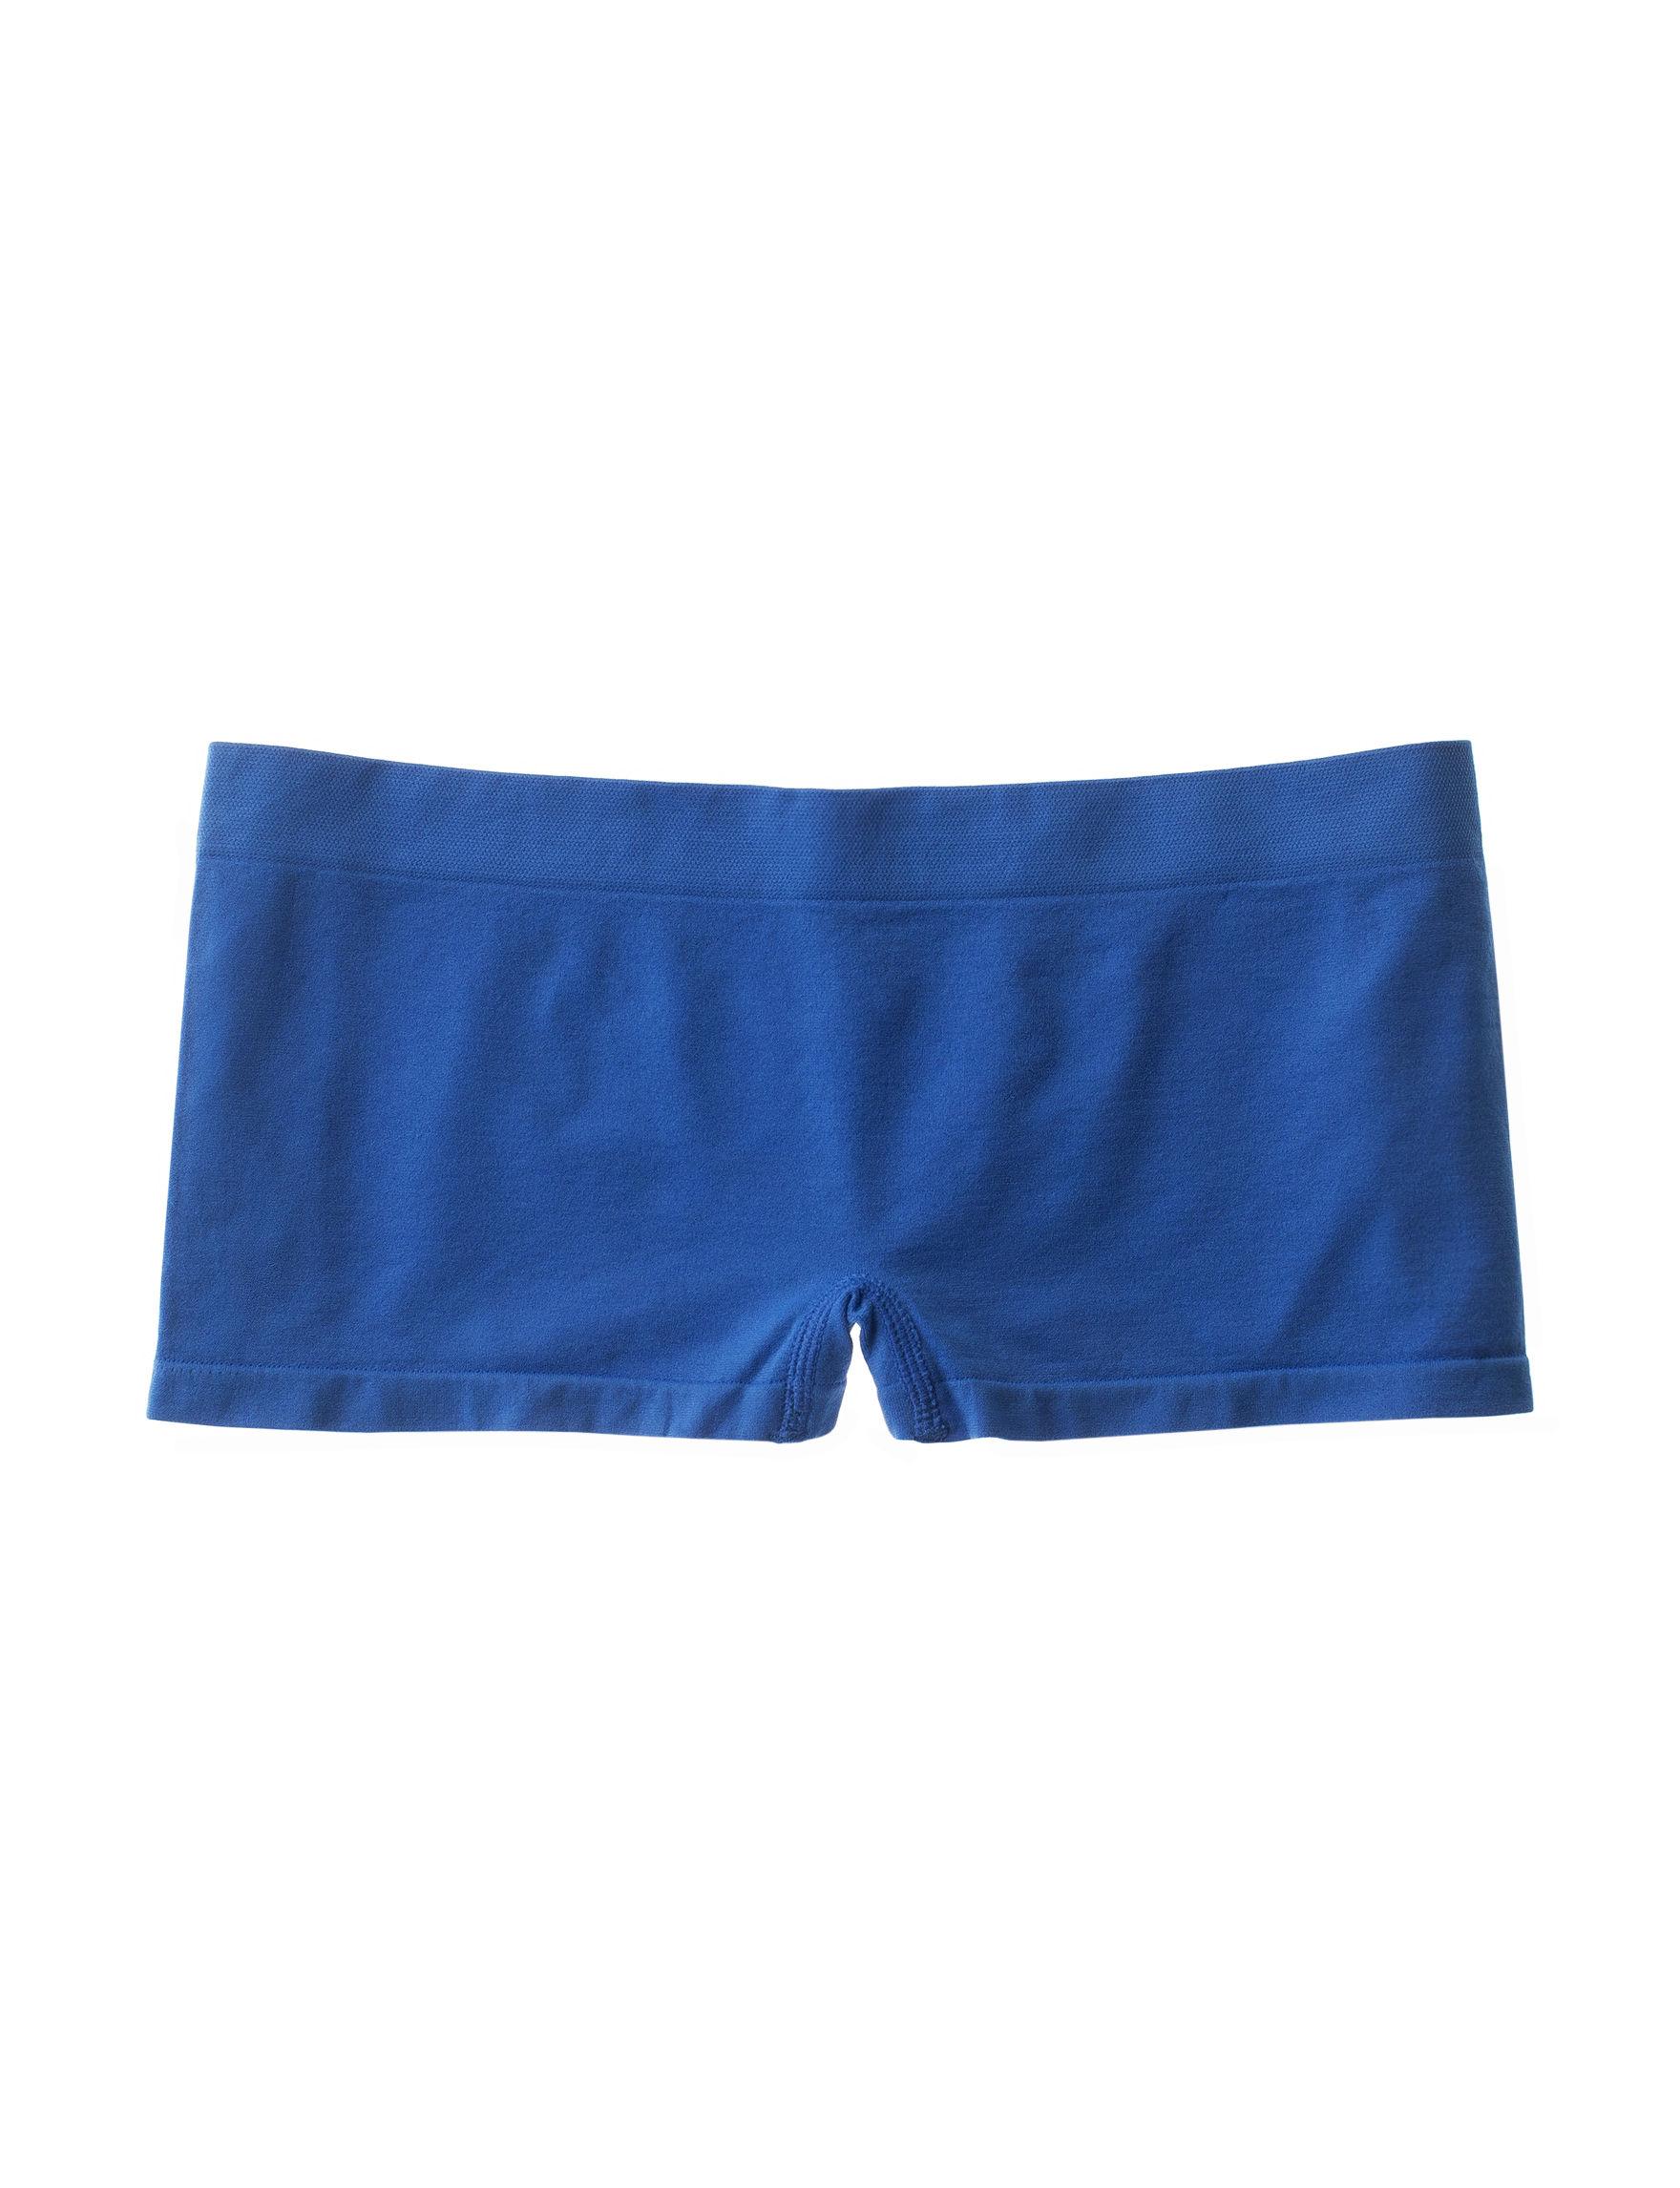 B Intimates Grey / Blue Panties Boyshort